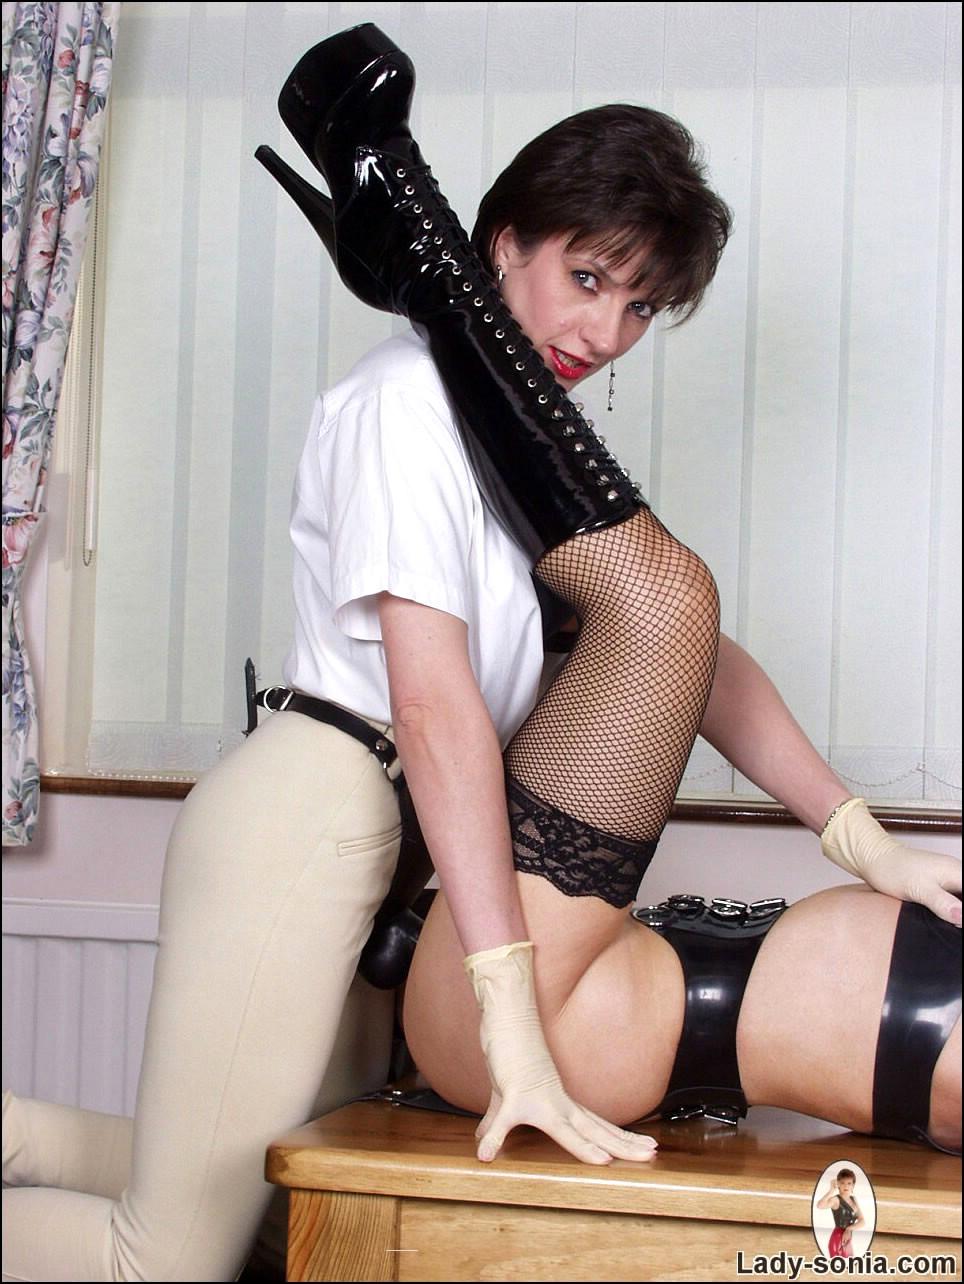 Hot Rough Lesbian Strap